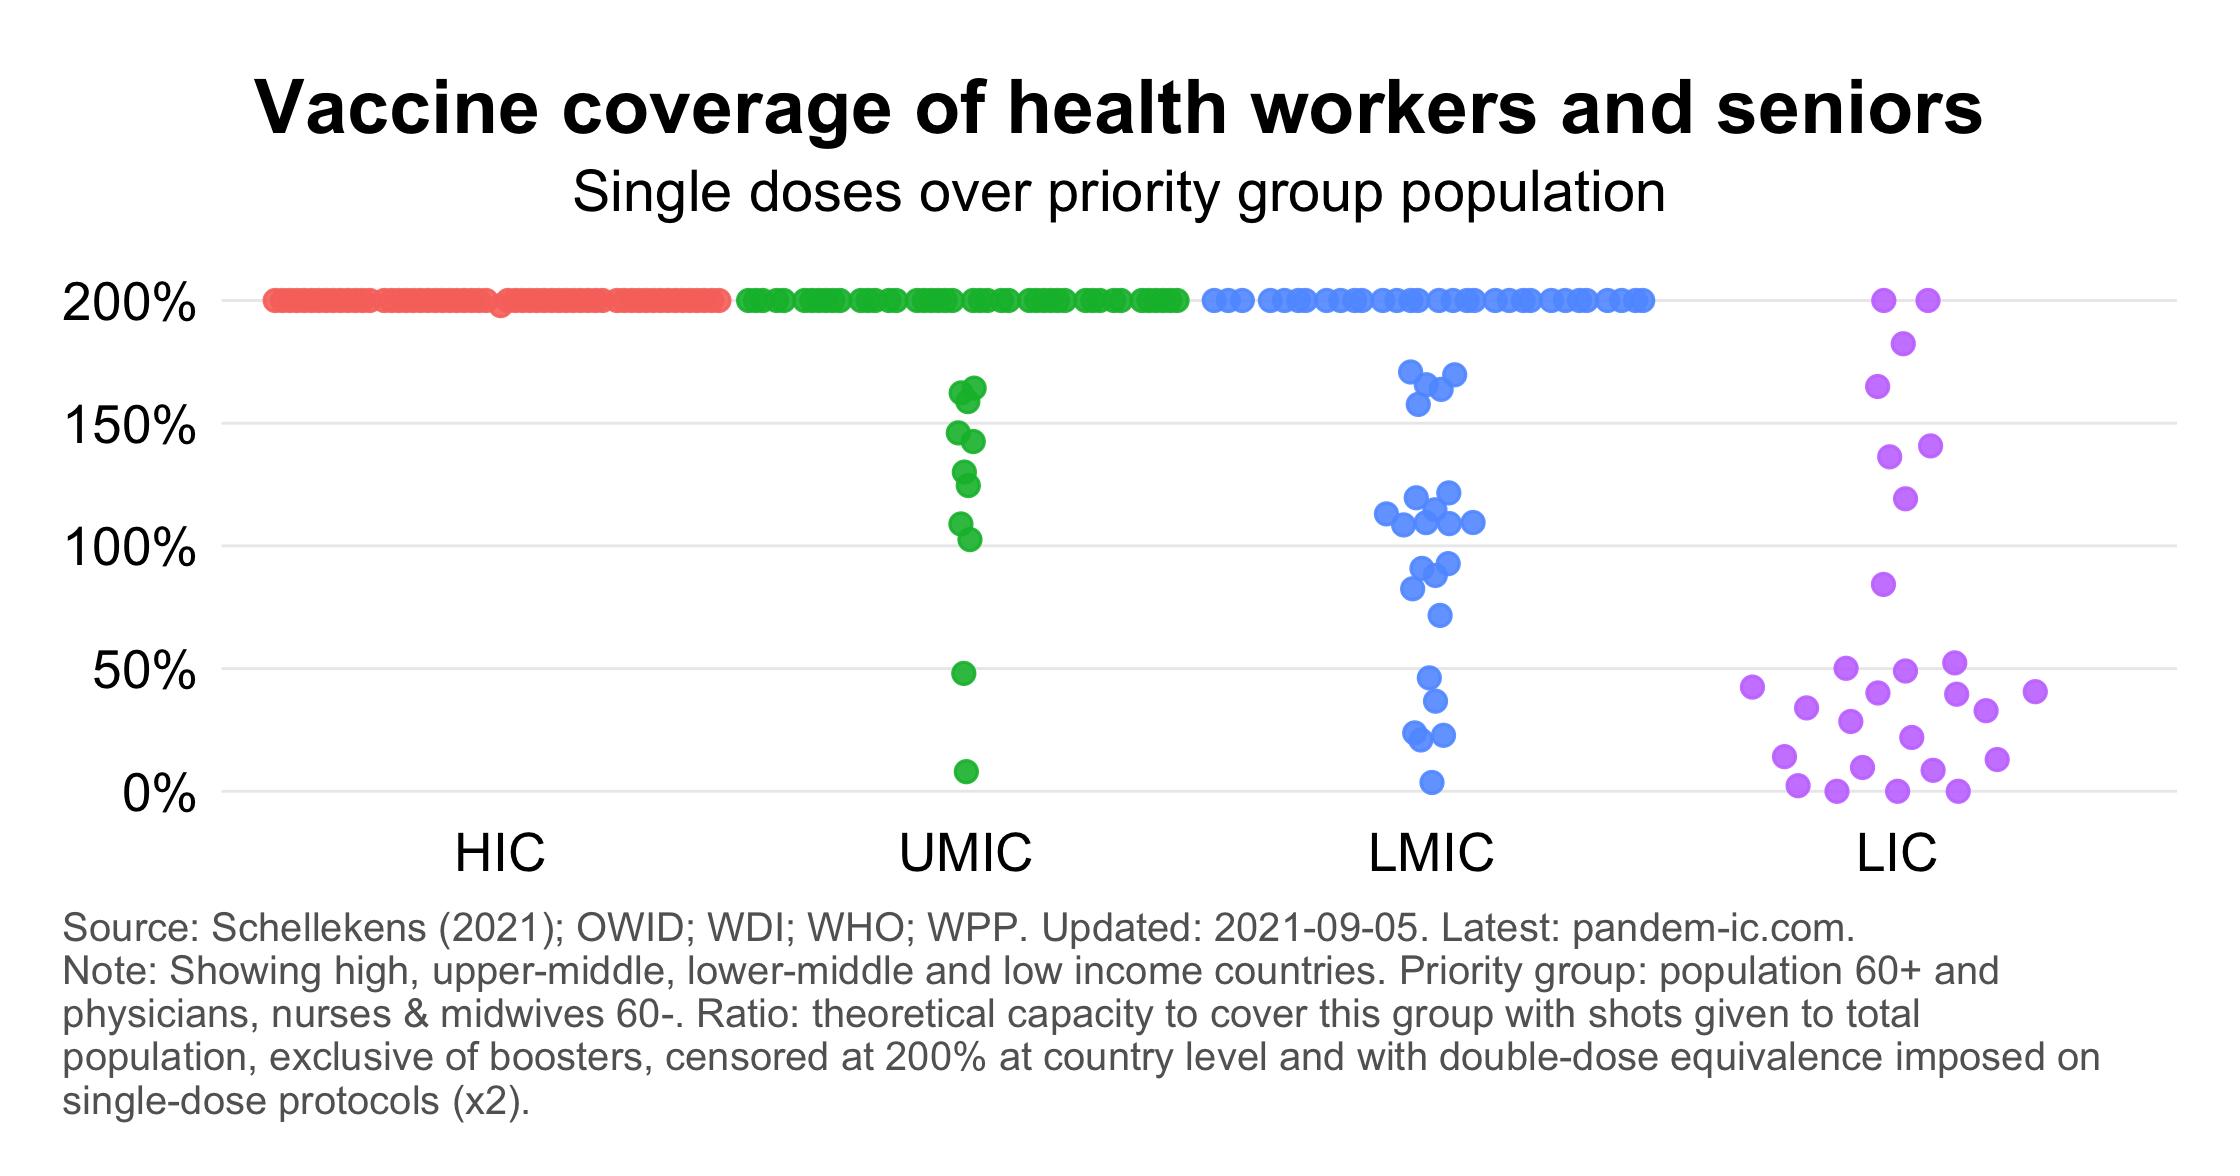 Single-shot coverage of medics and 60+ population